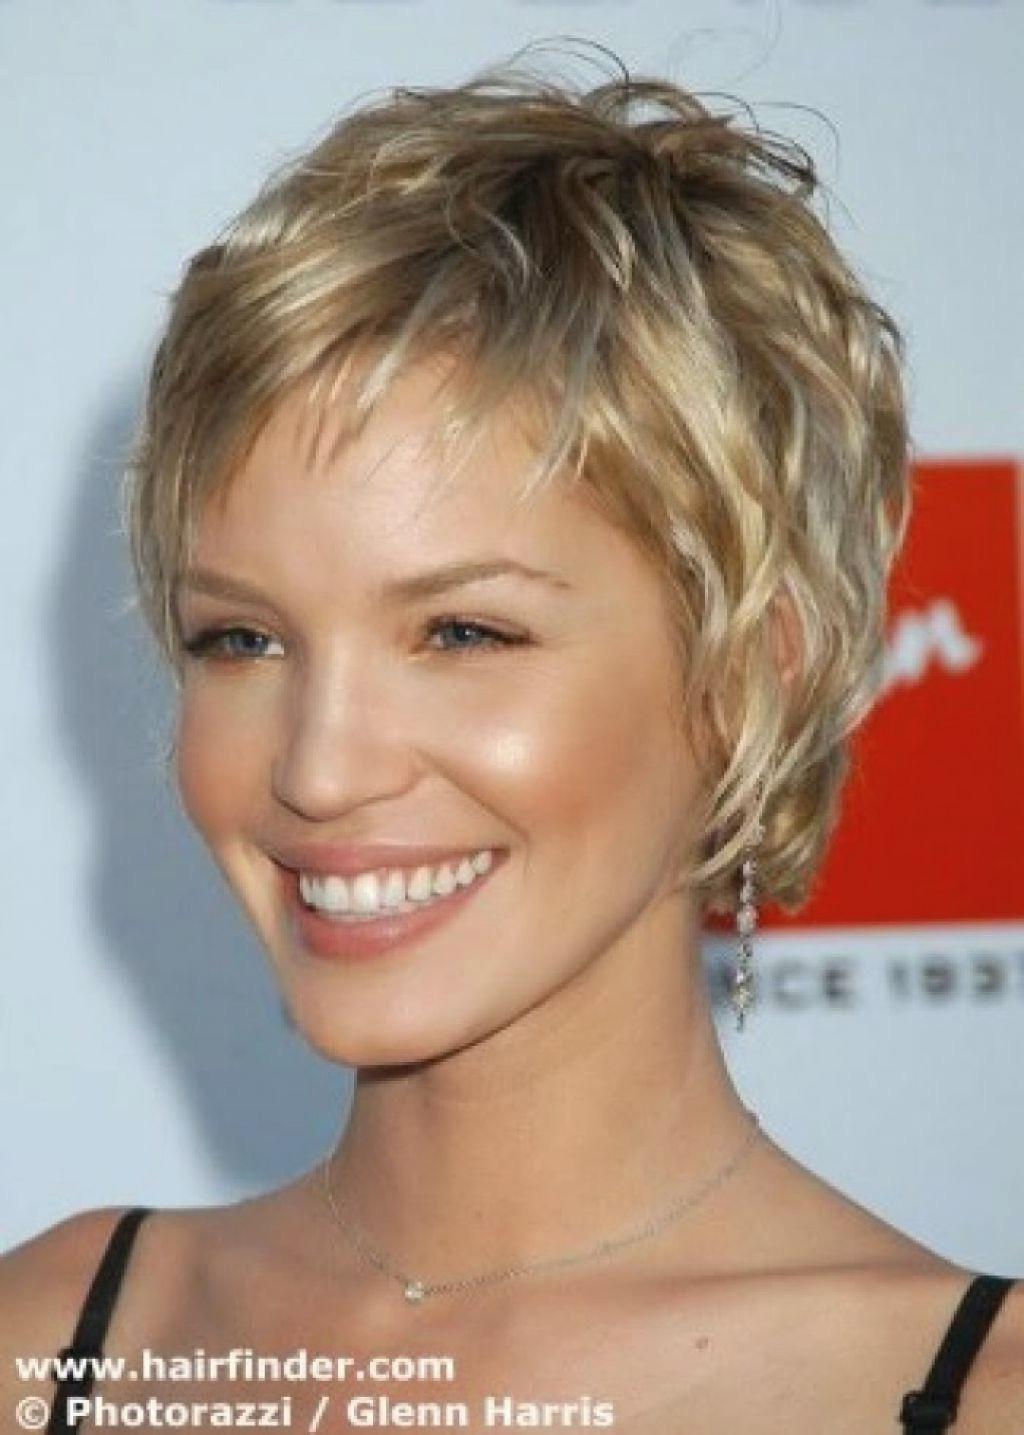 20 Short Hairstyles Without Bangs – Razanflight Inside Short Haircuts Without Bangs (View 4 of 25)